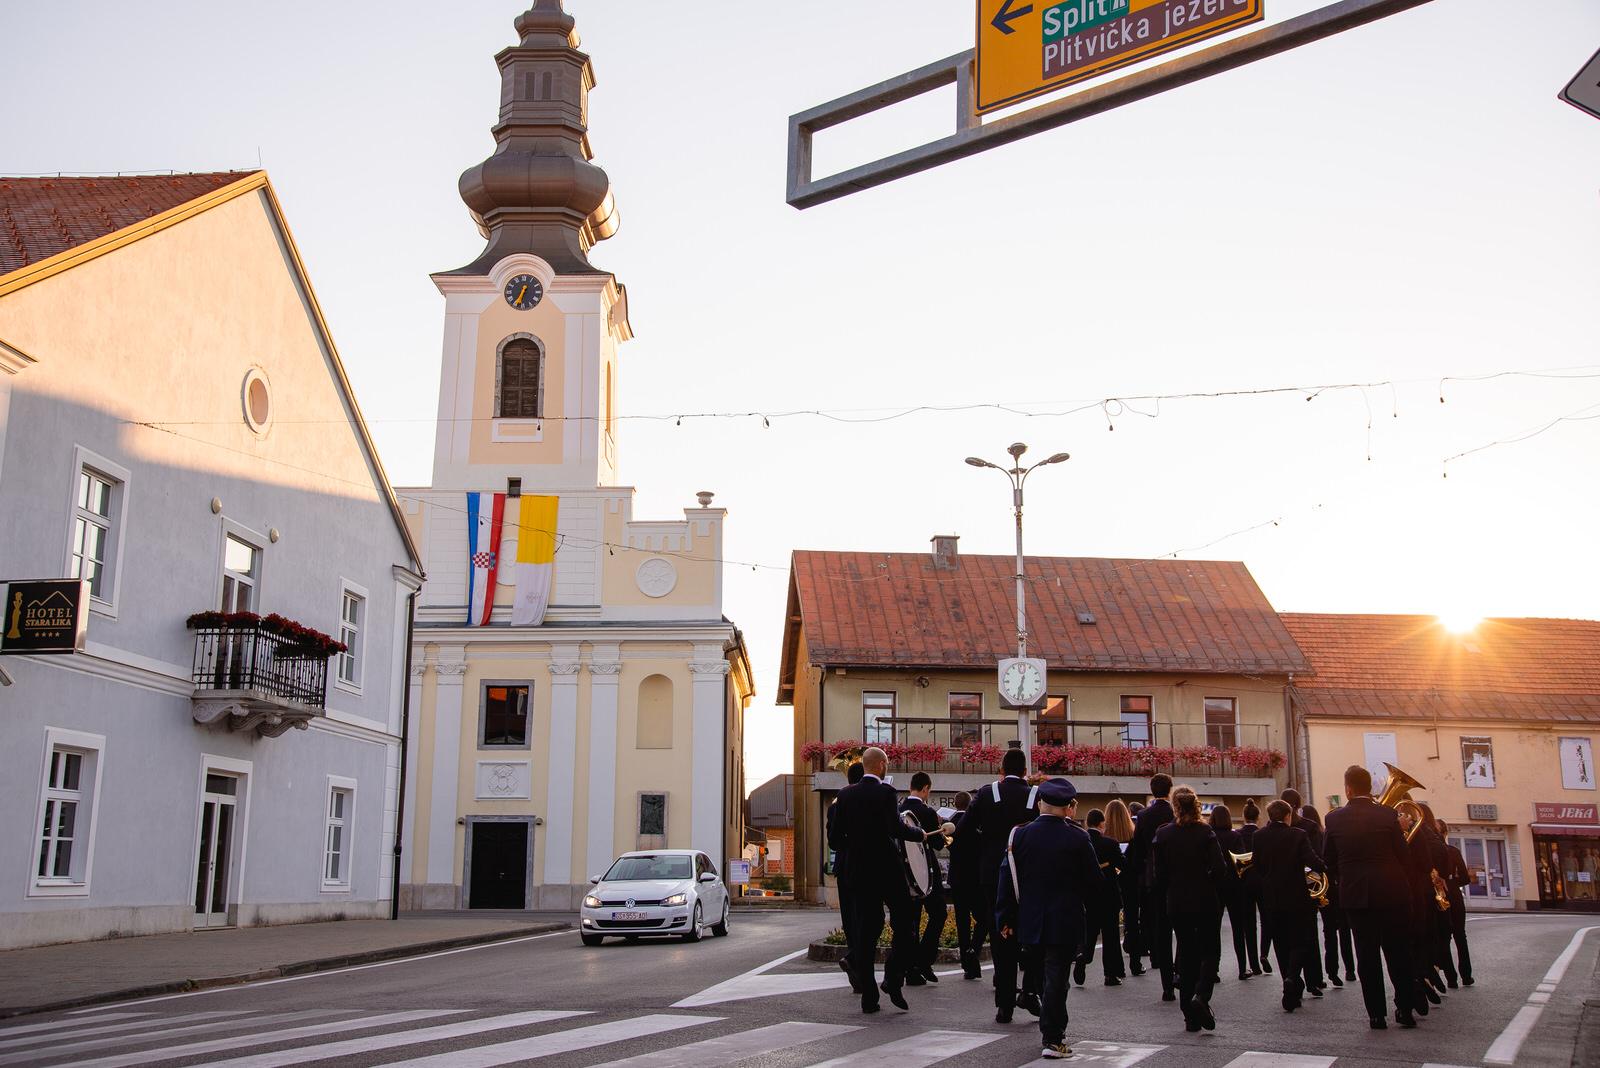 likaclub_budnica puhačkog orkestra povodom dana grada_22_7_2020 (87)